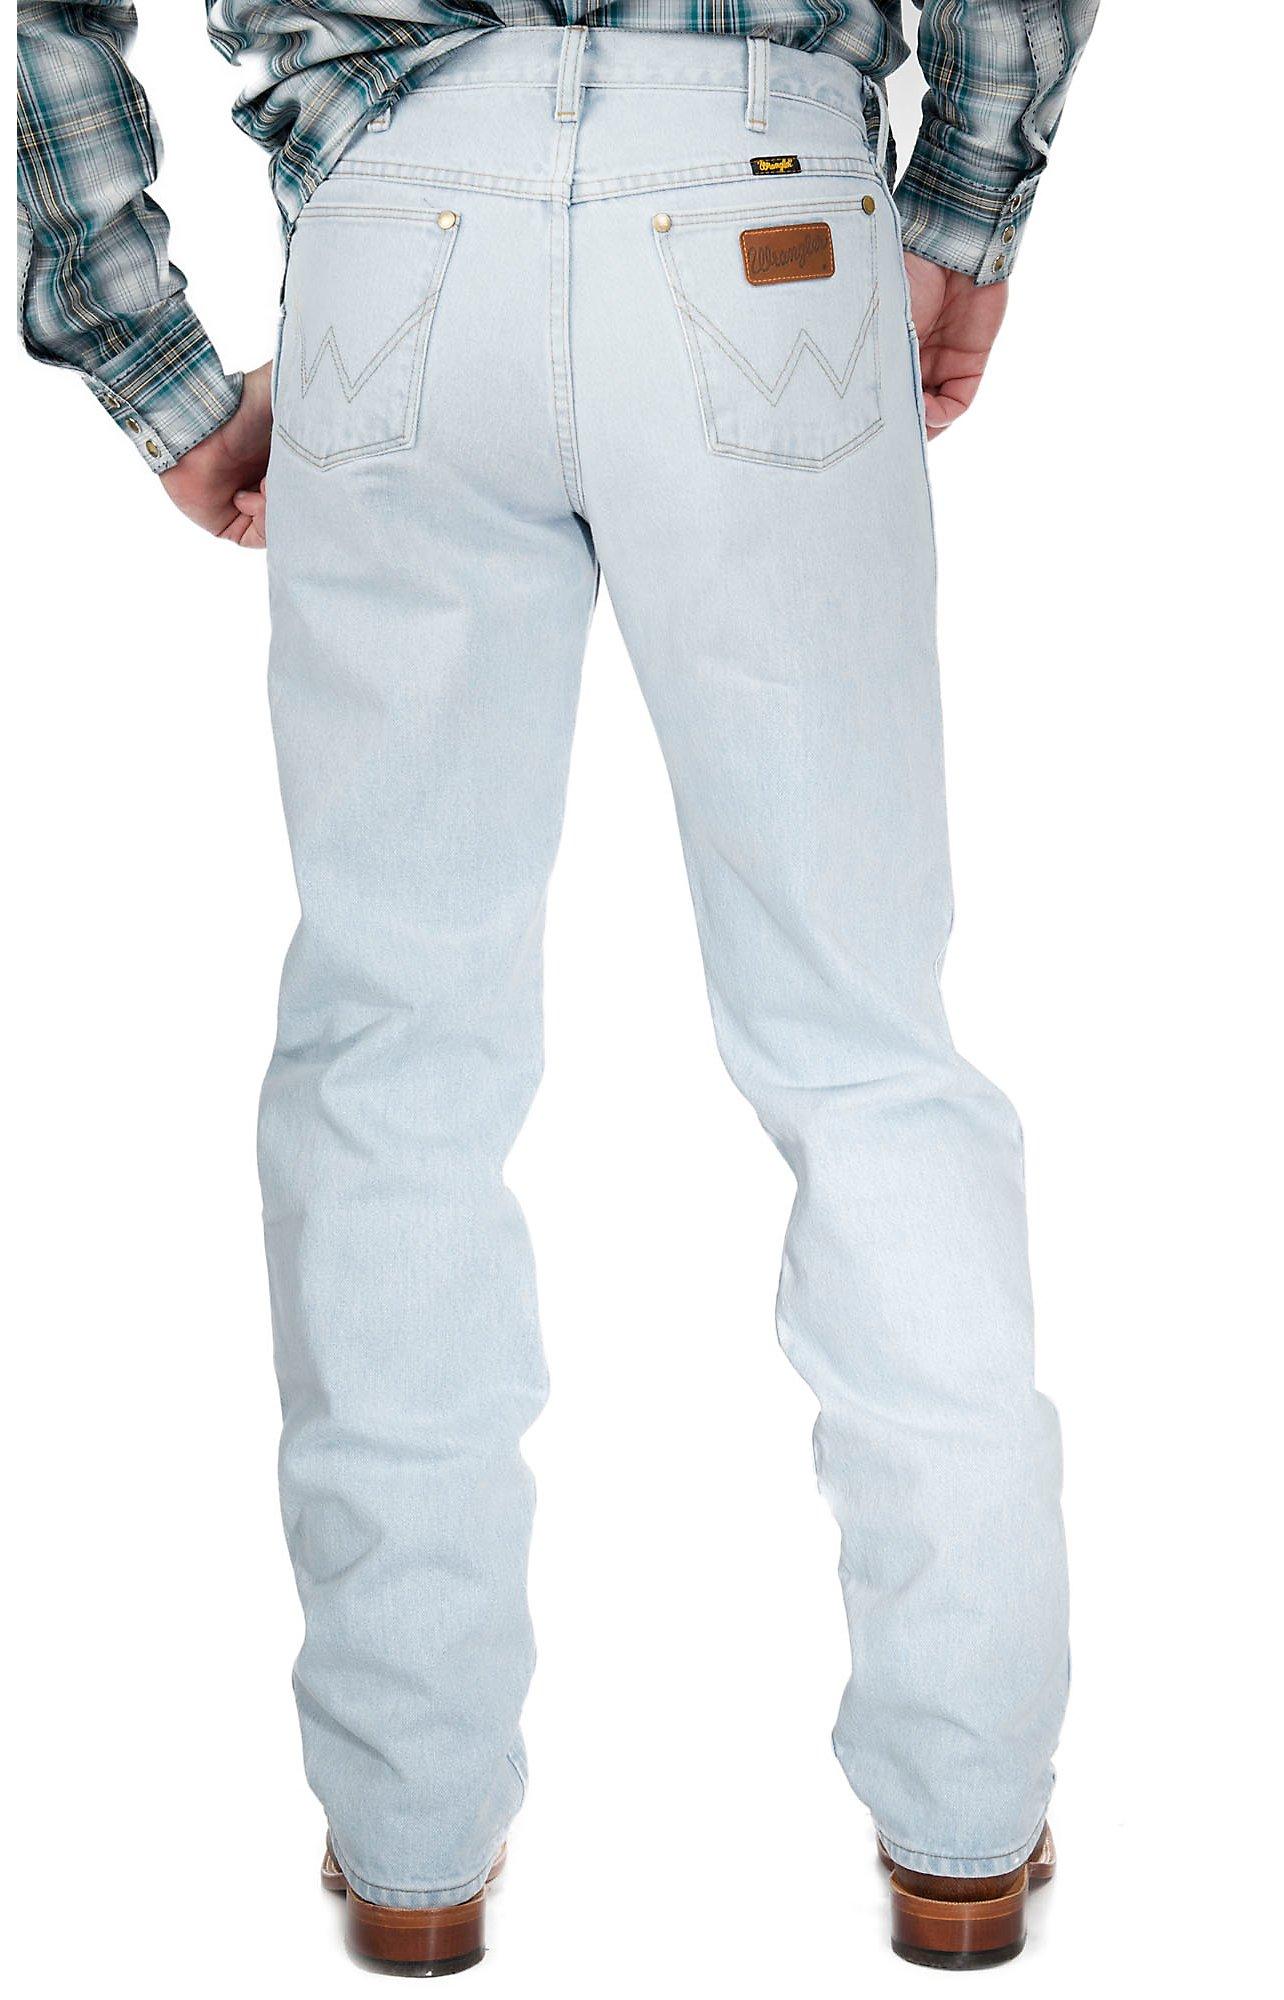 Shop Wrangler Cowboy Cut Jeans for Men   Free Shipping $50  ...